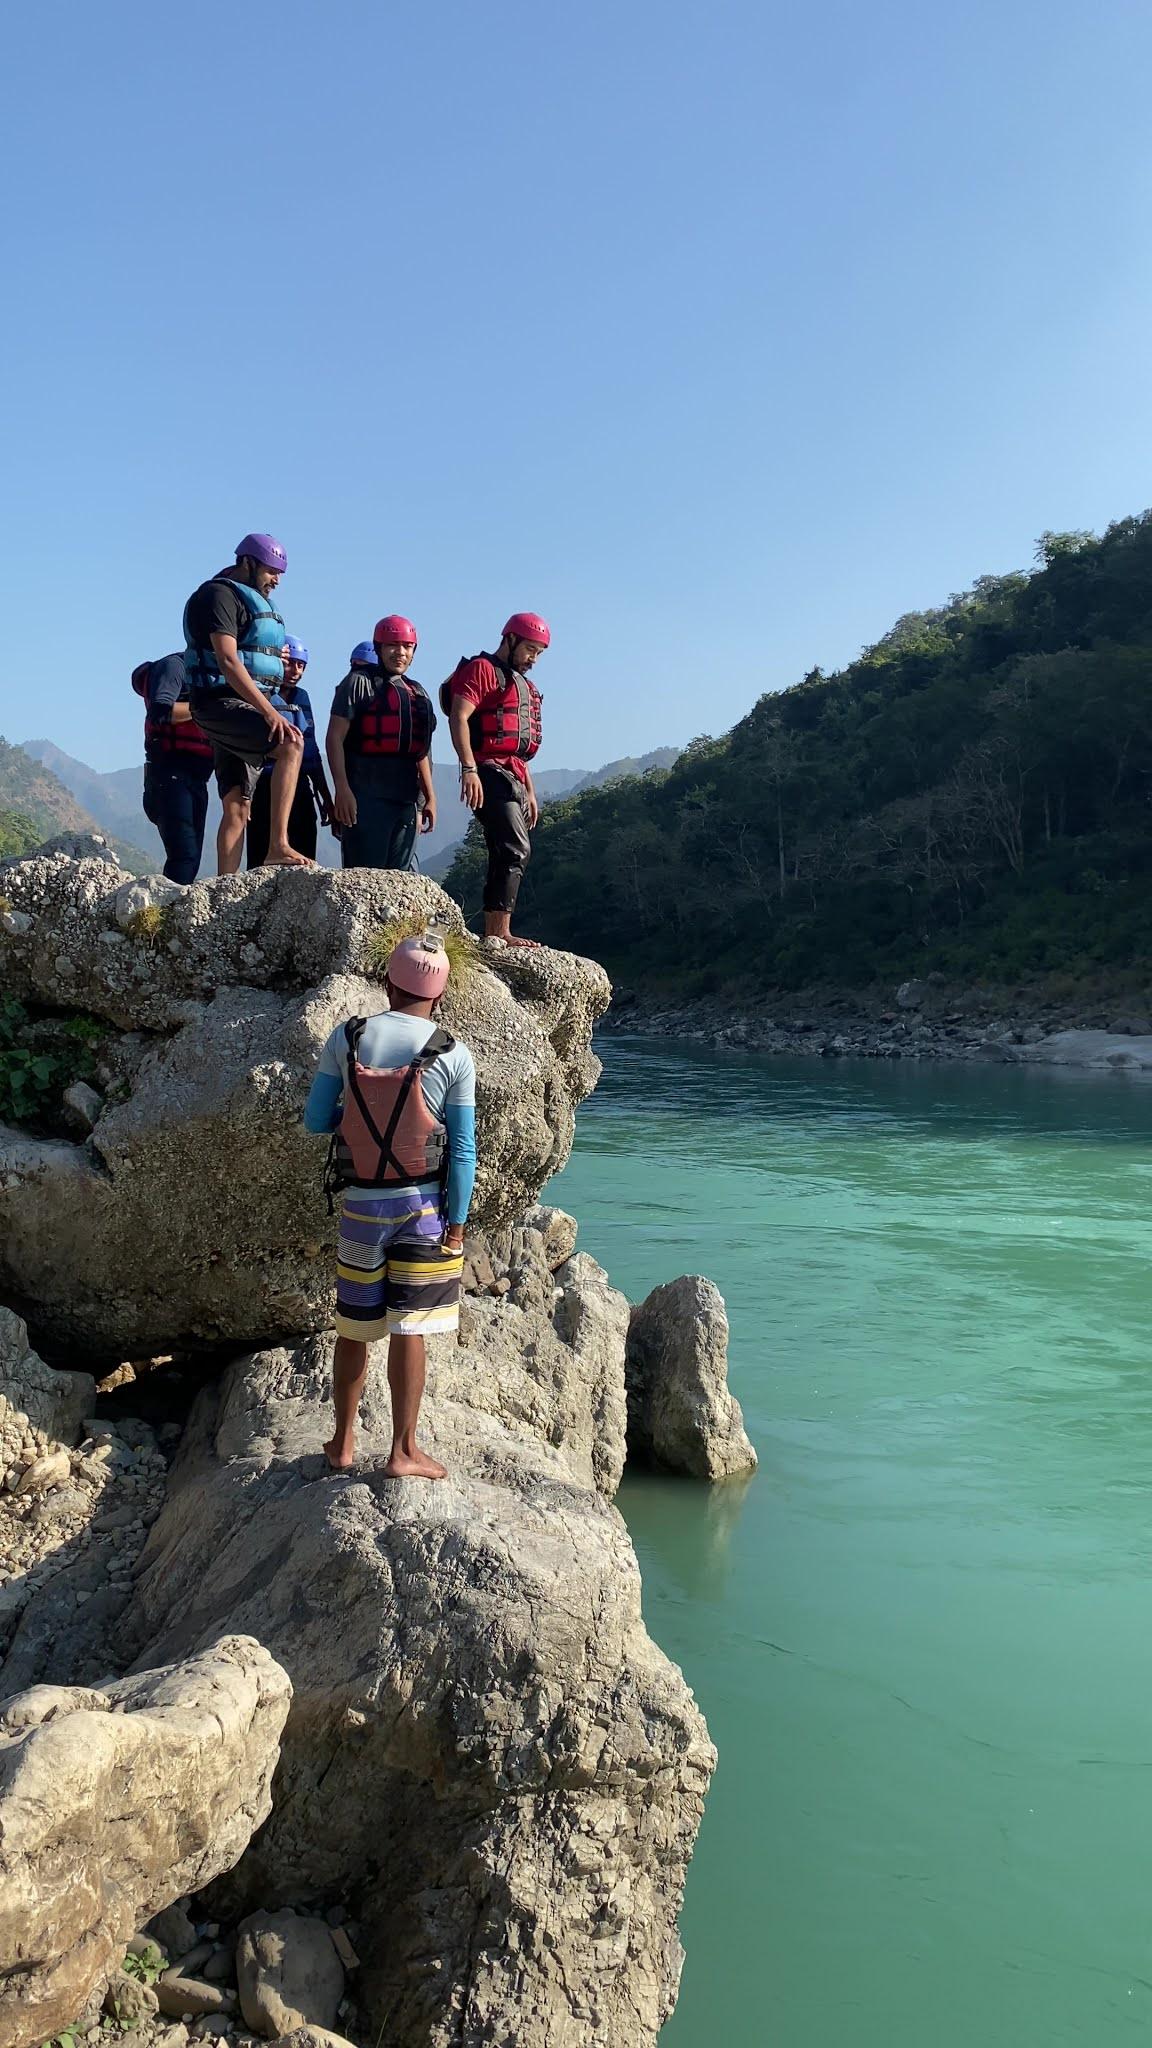 Cliff Jumping during River Rafting, Rishikesh